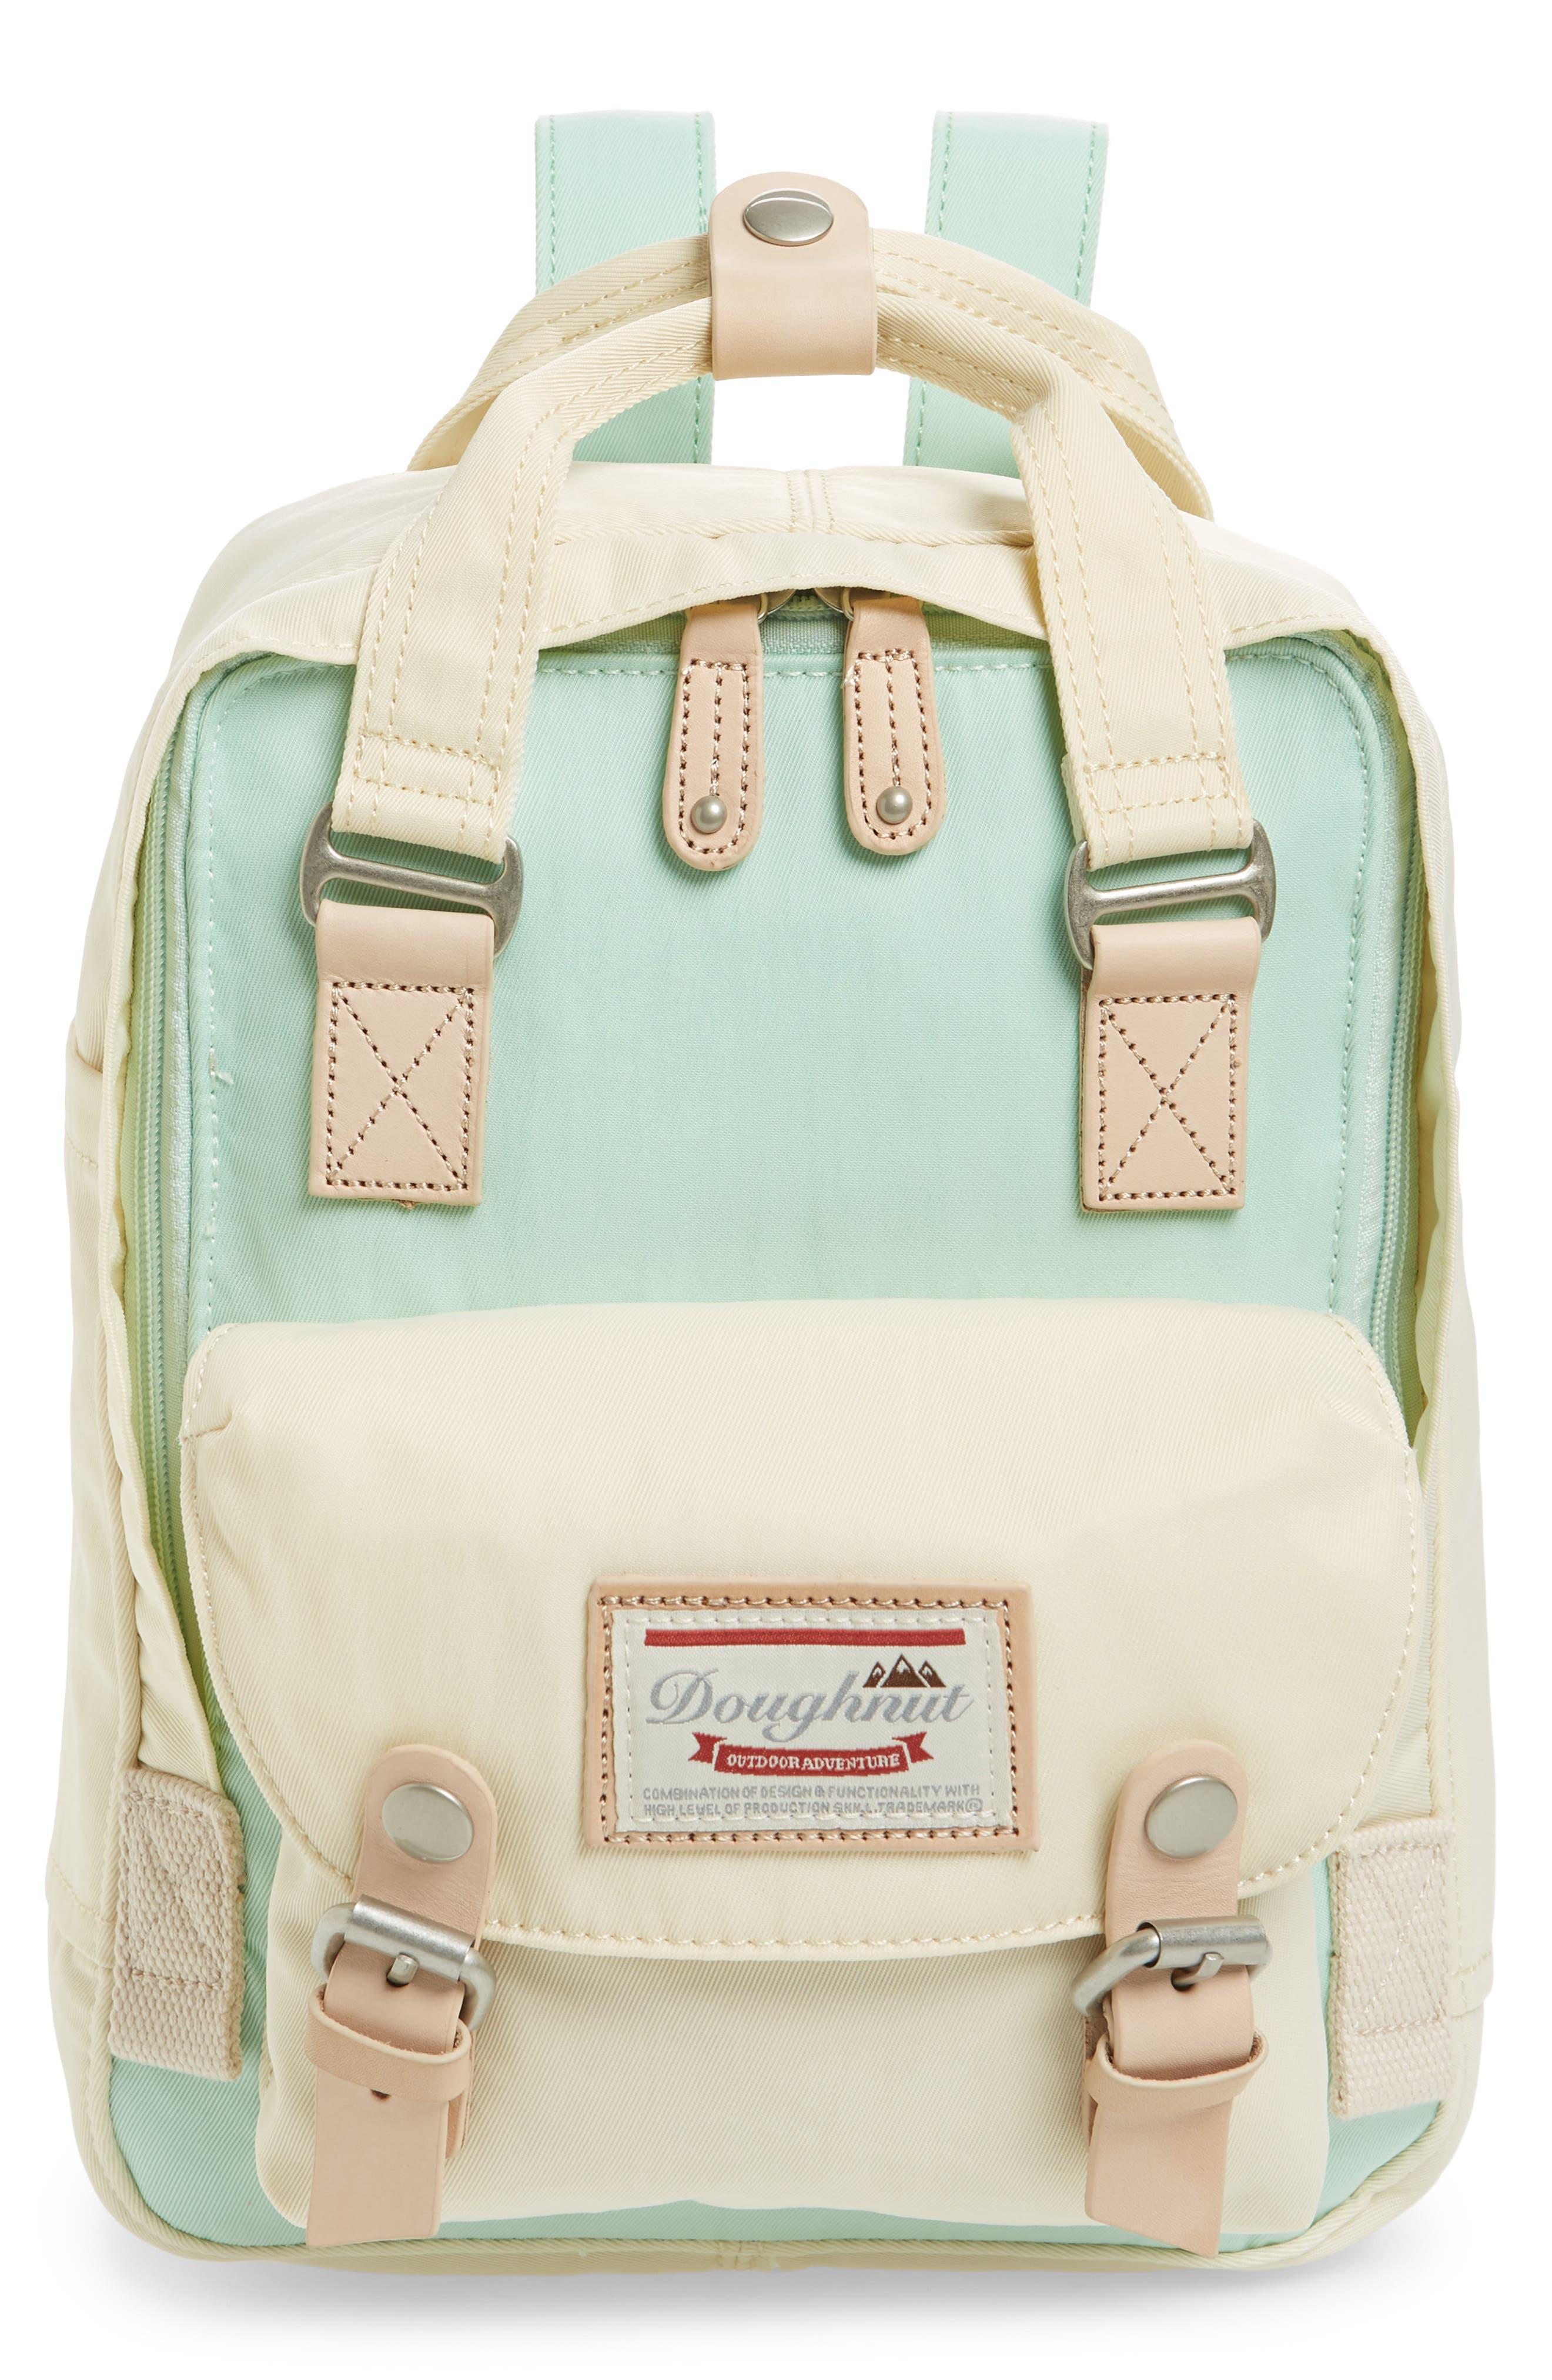 DOUGHNUT Mini Macaroon Colorblock Water Resistant Backpack - Green in Soda/ Cream